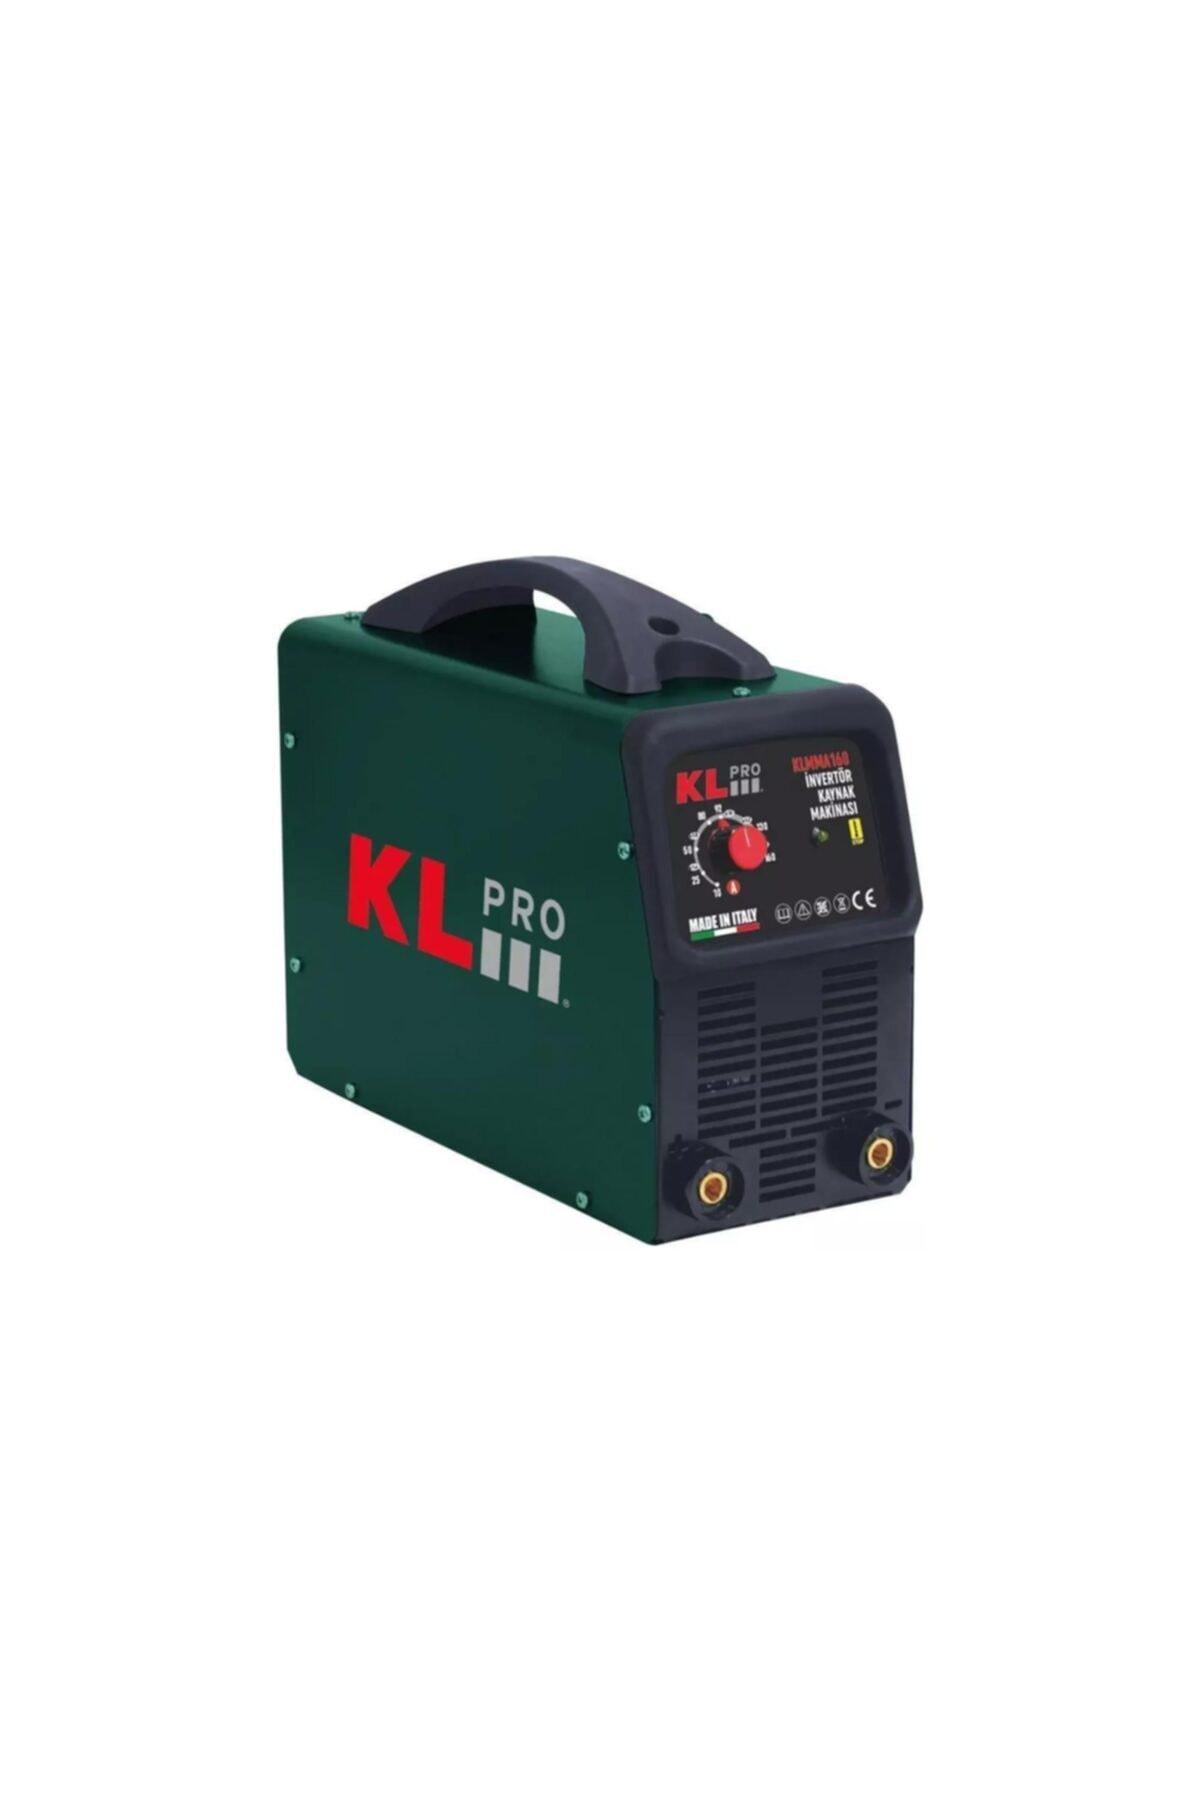 KLPRO 160 Amper Inverter Kaynak Makinesi Klmma160 1